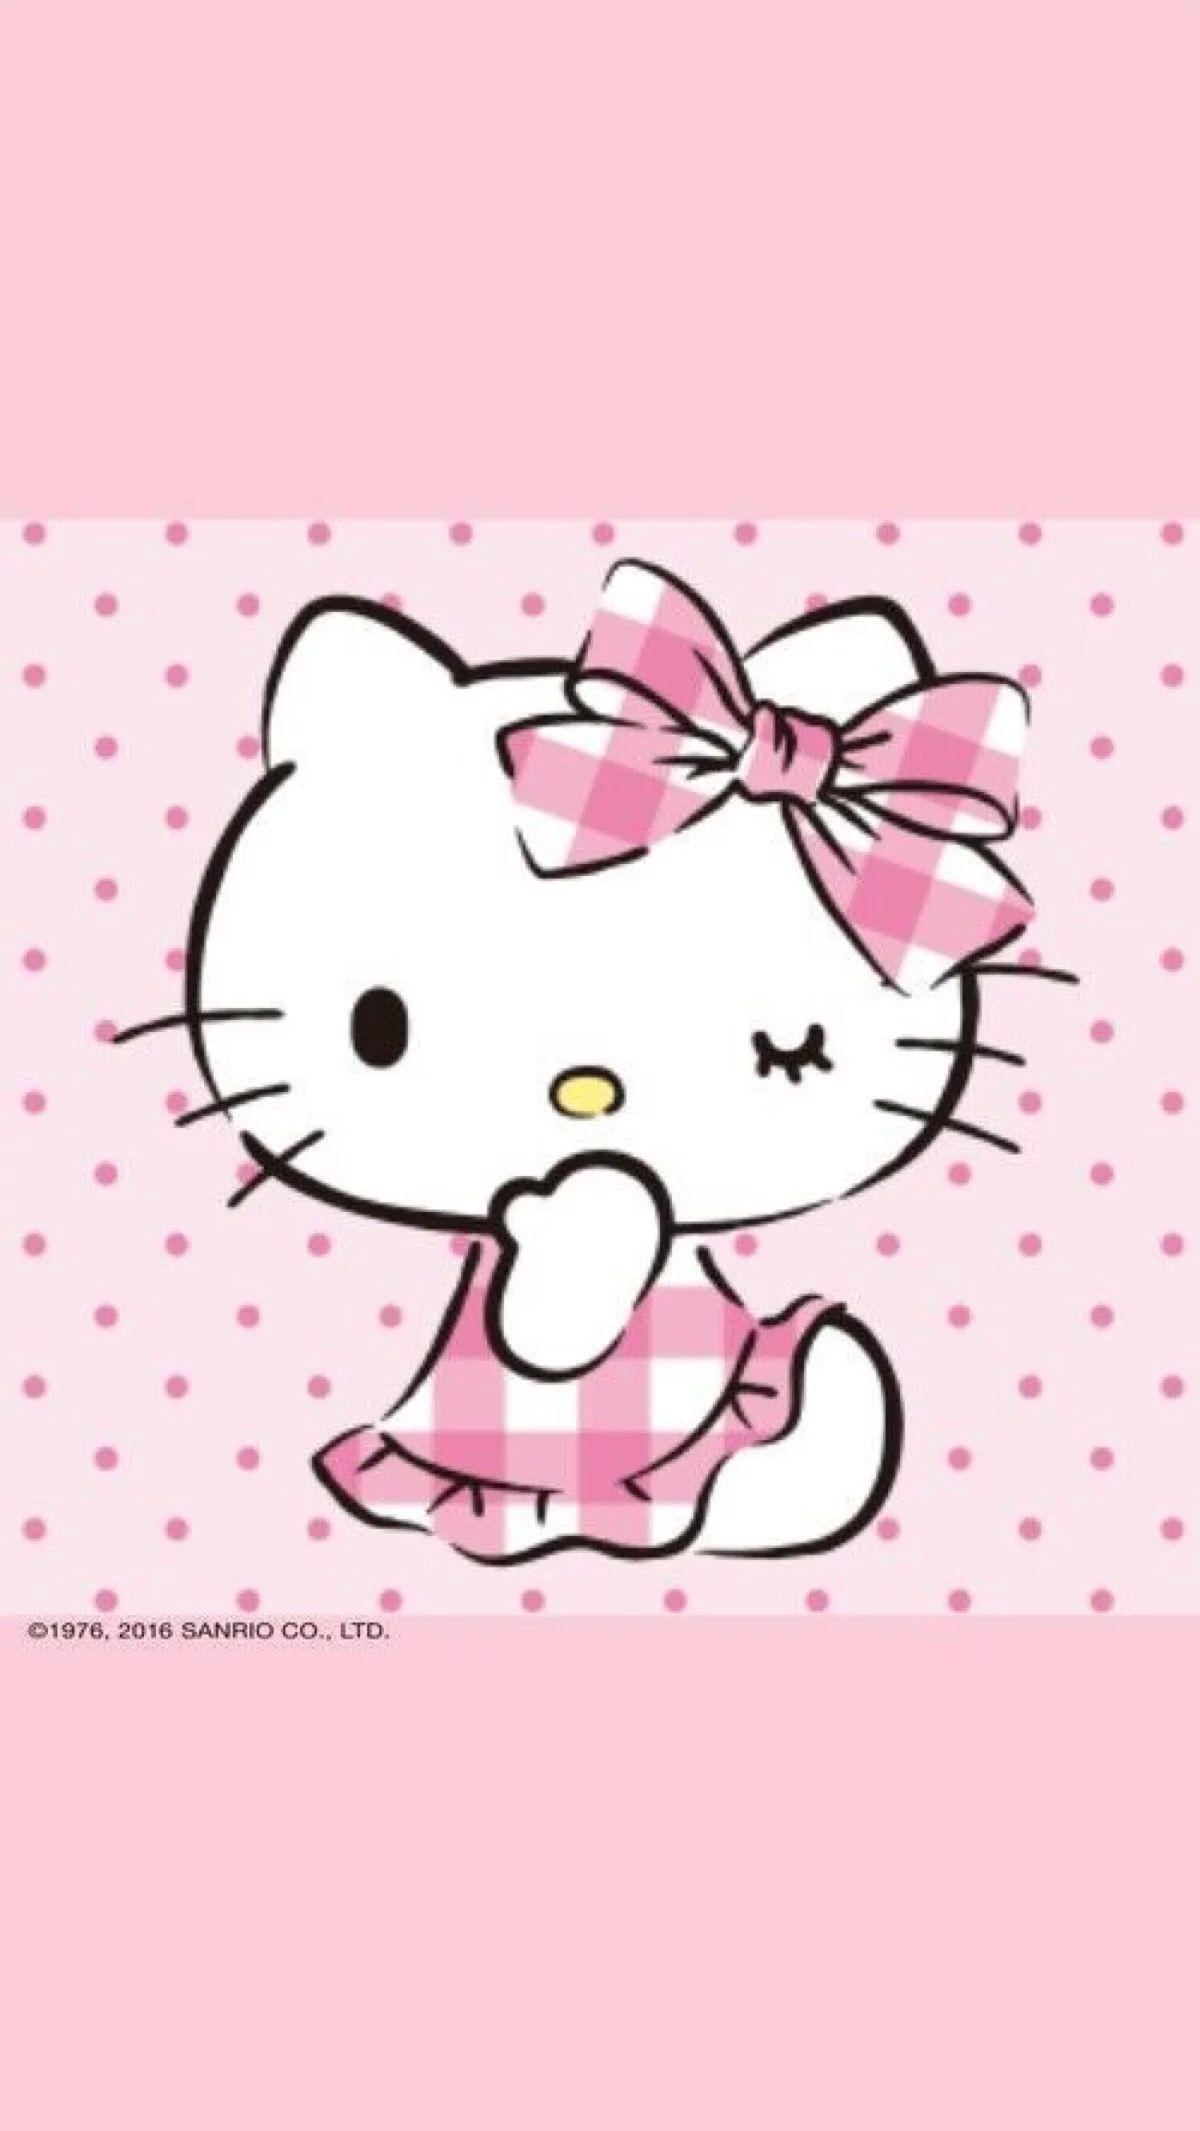 Pin By Pankeaw On Wallpaper Hello Kitty - Pinterest -